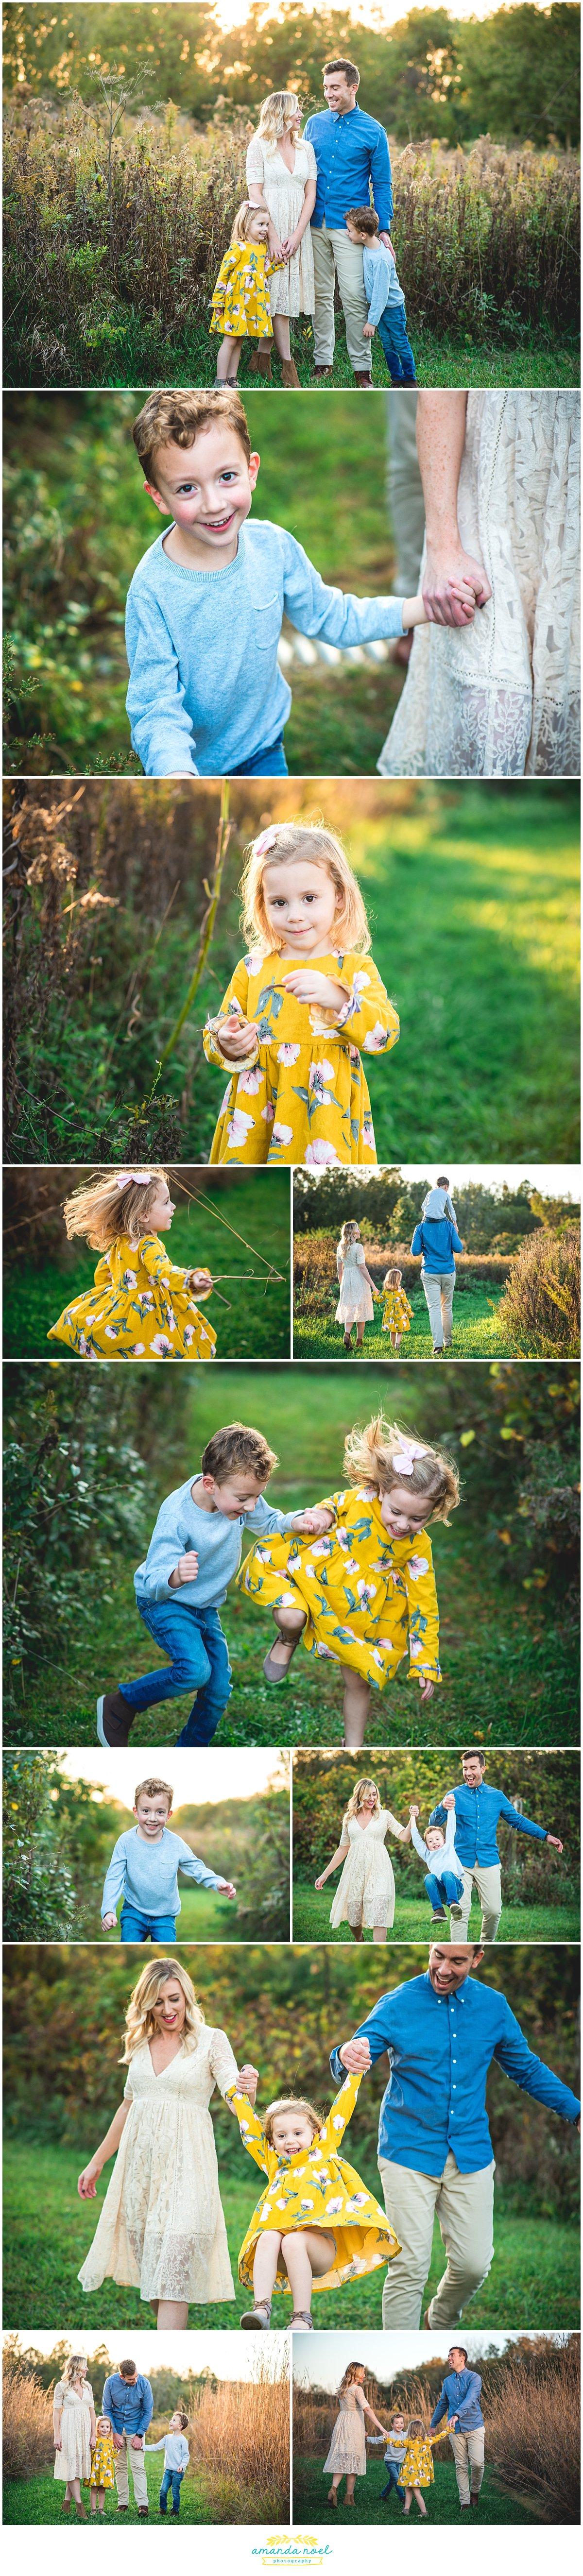 Columbus Ohio family photographer | Amanda Noel Photography